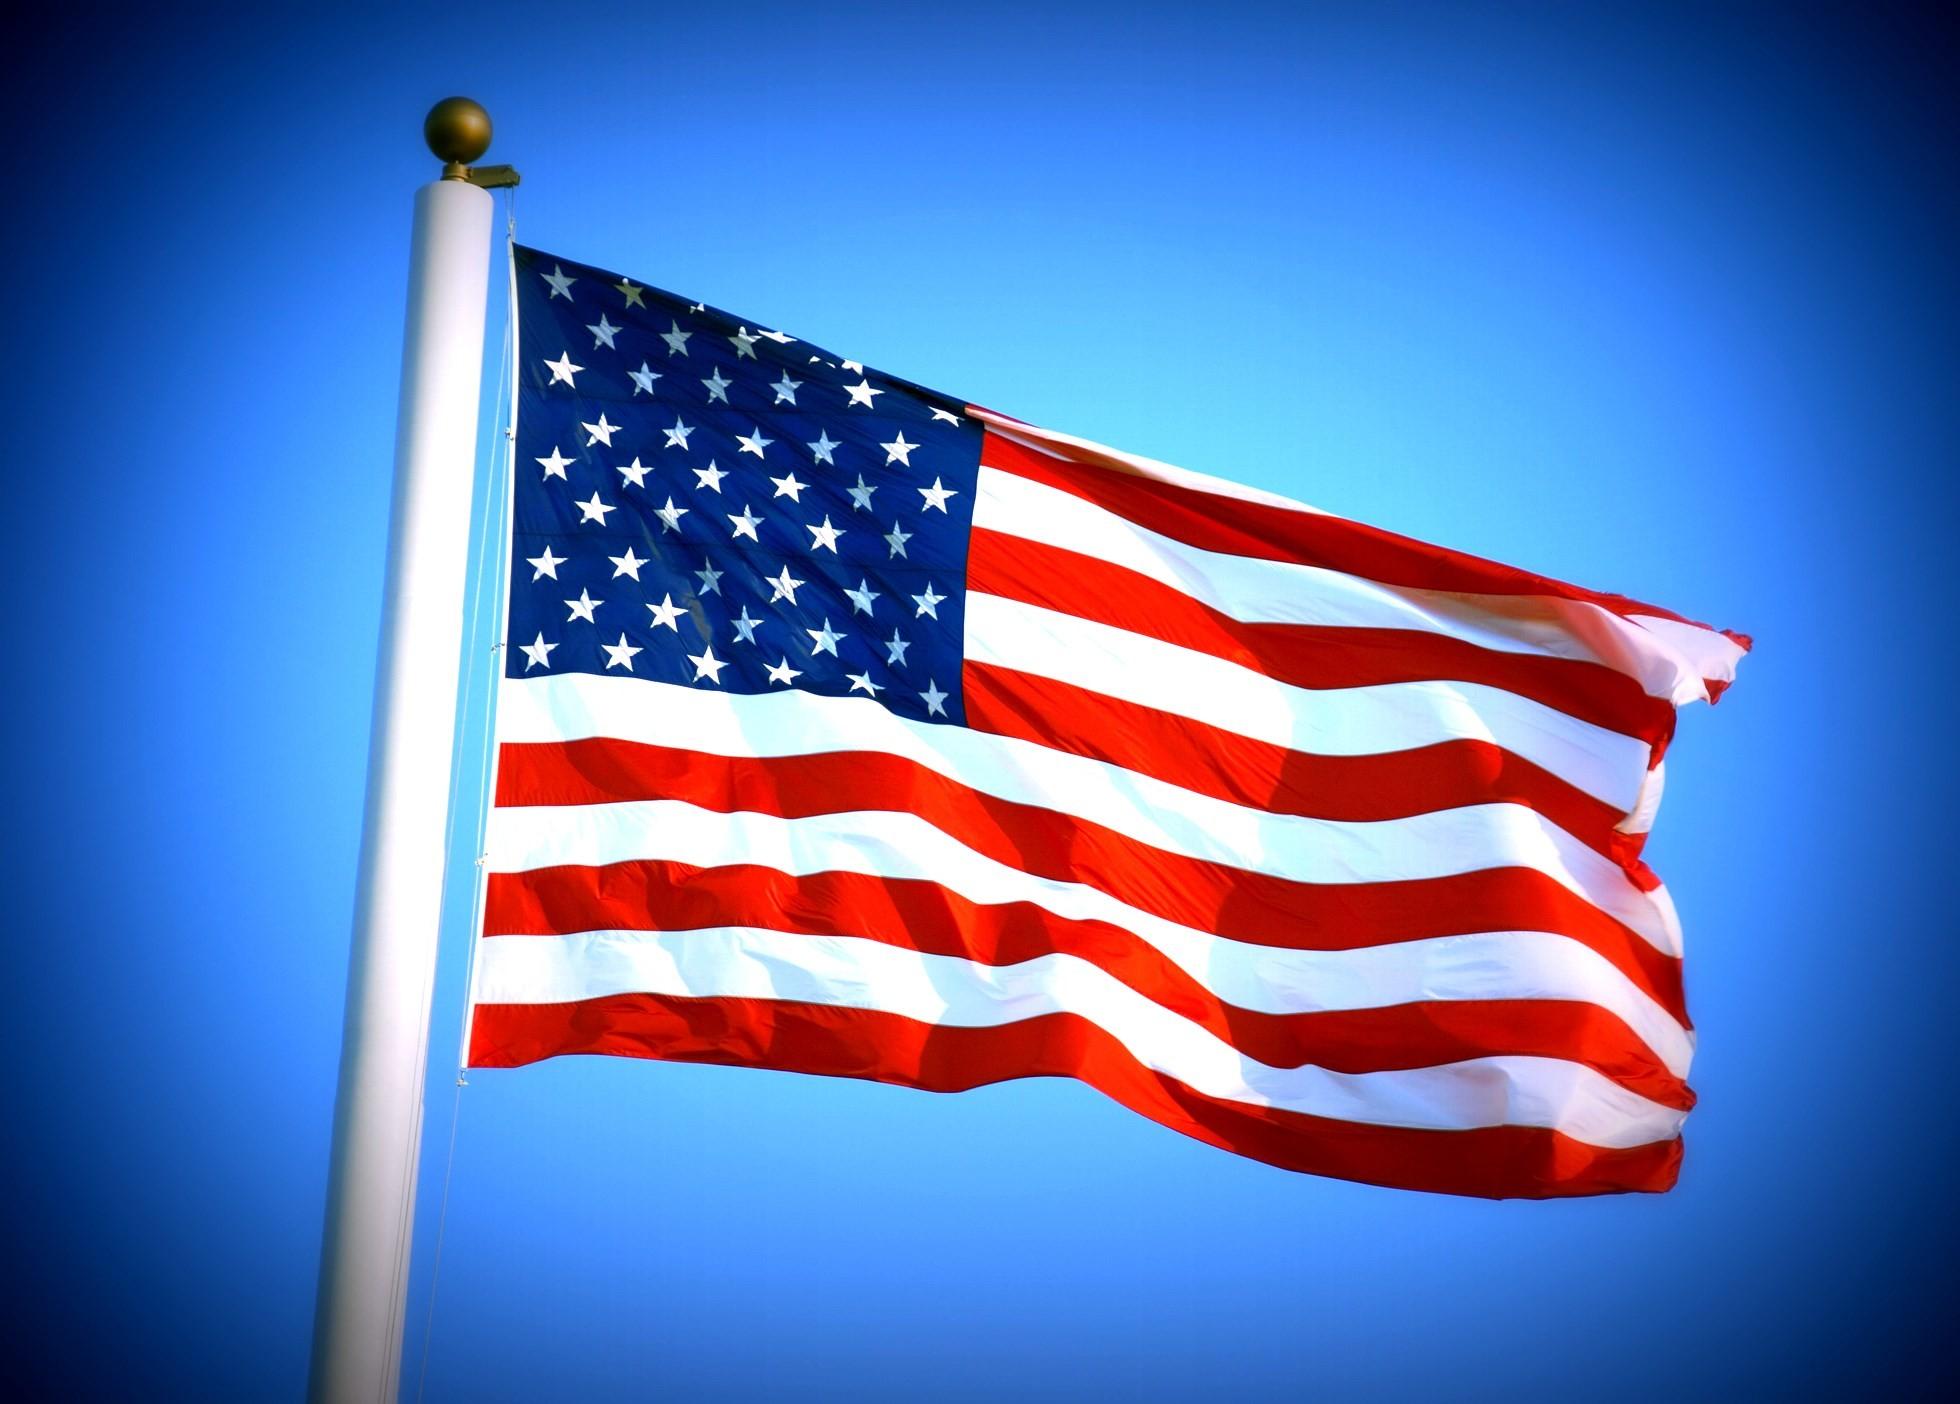 american flag free screensaver wallpapers